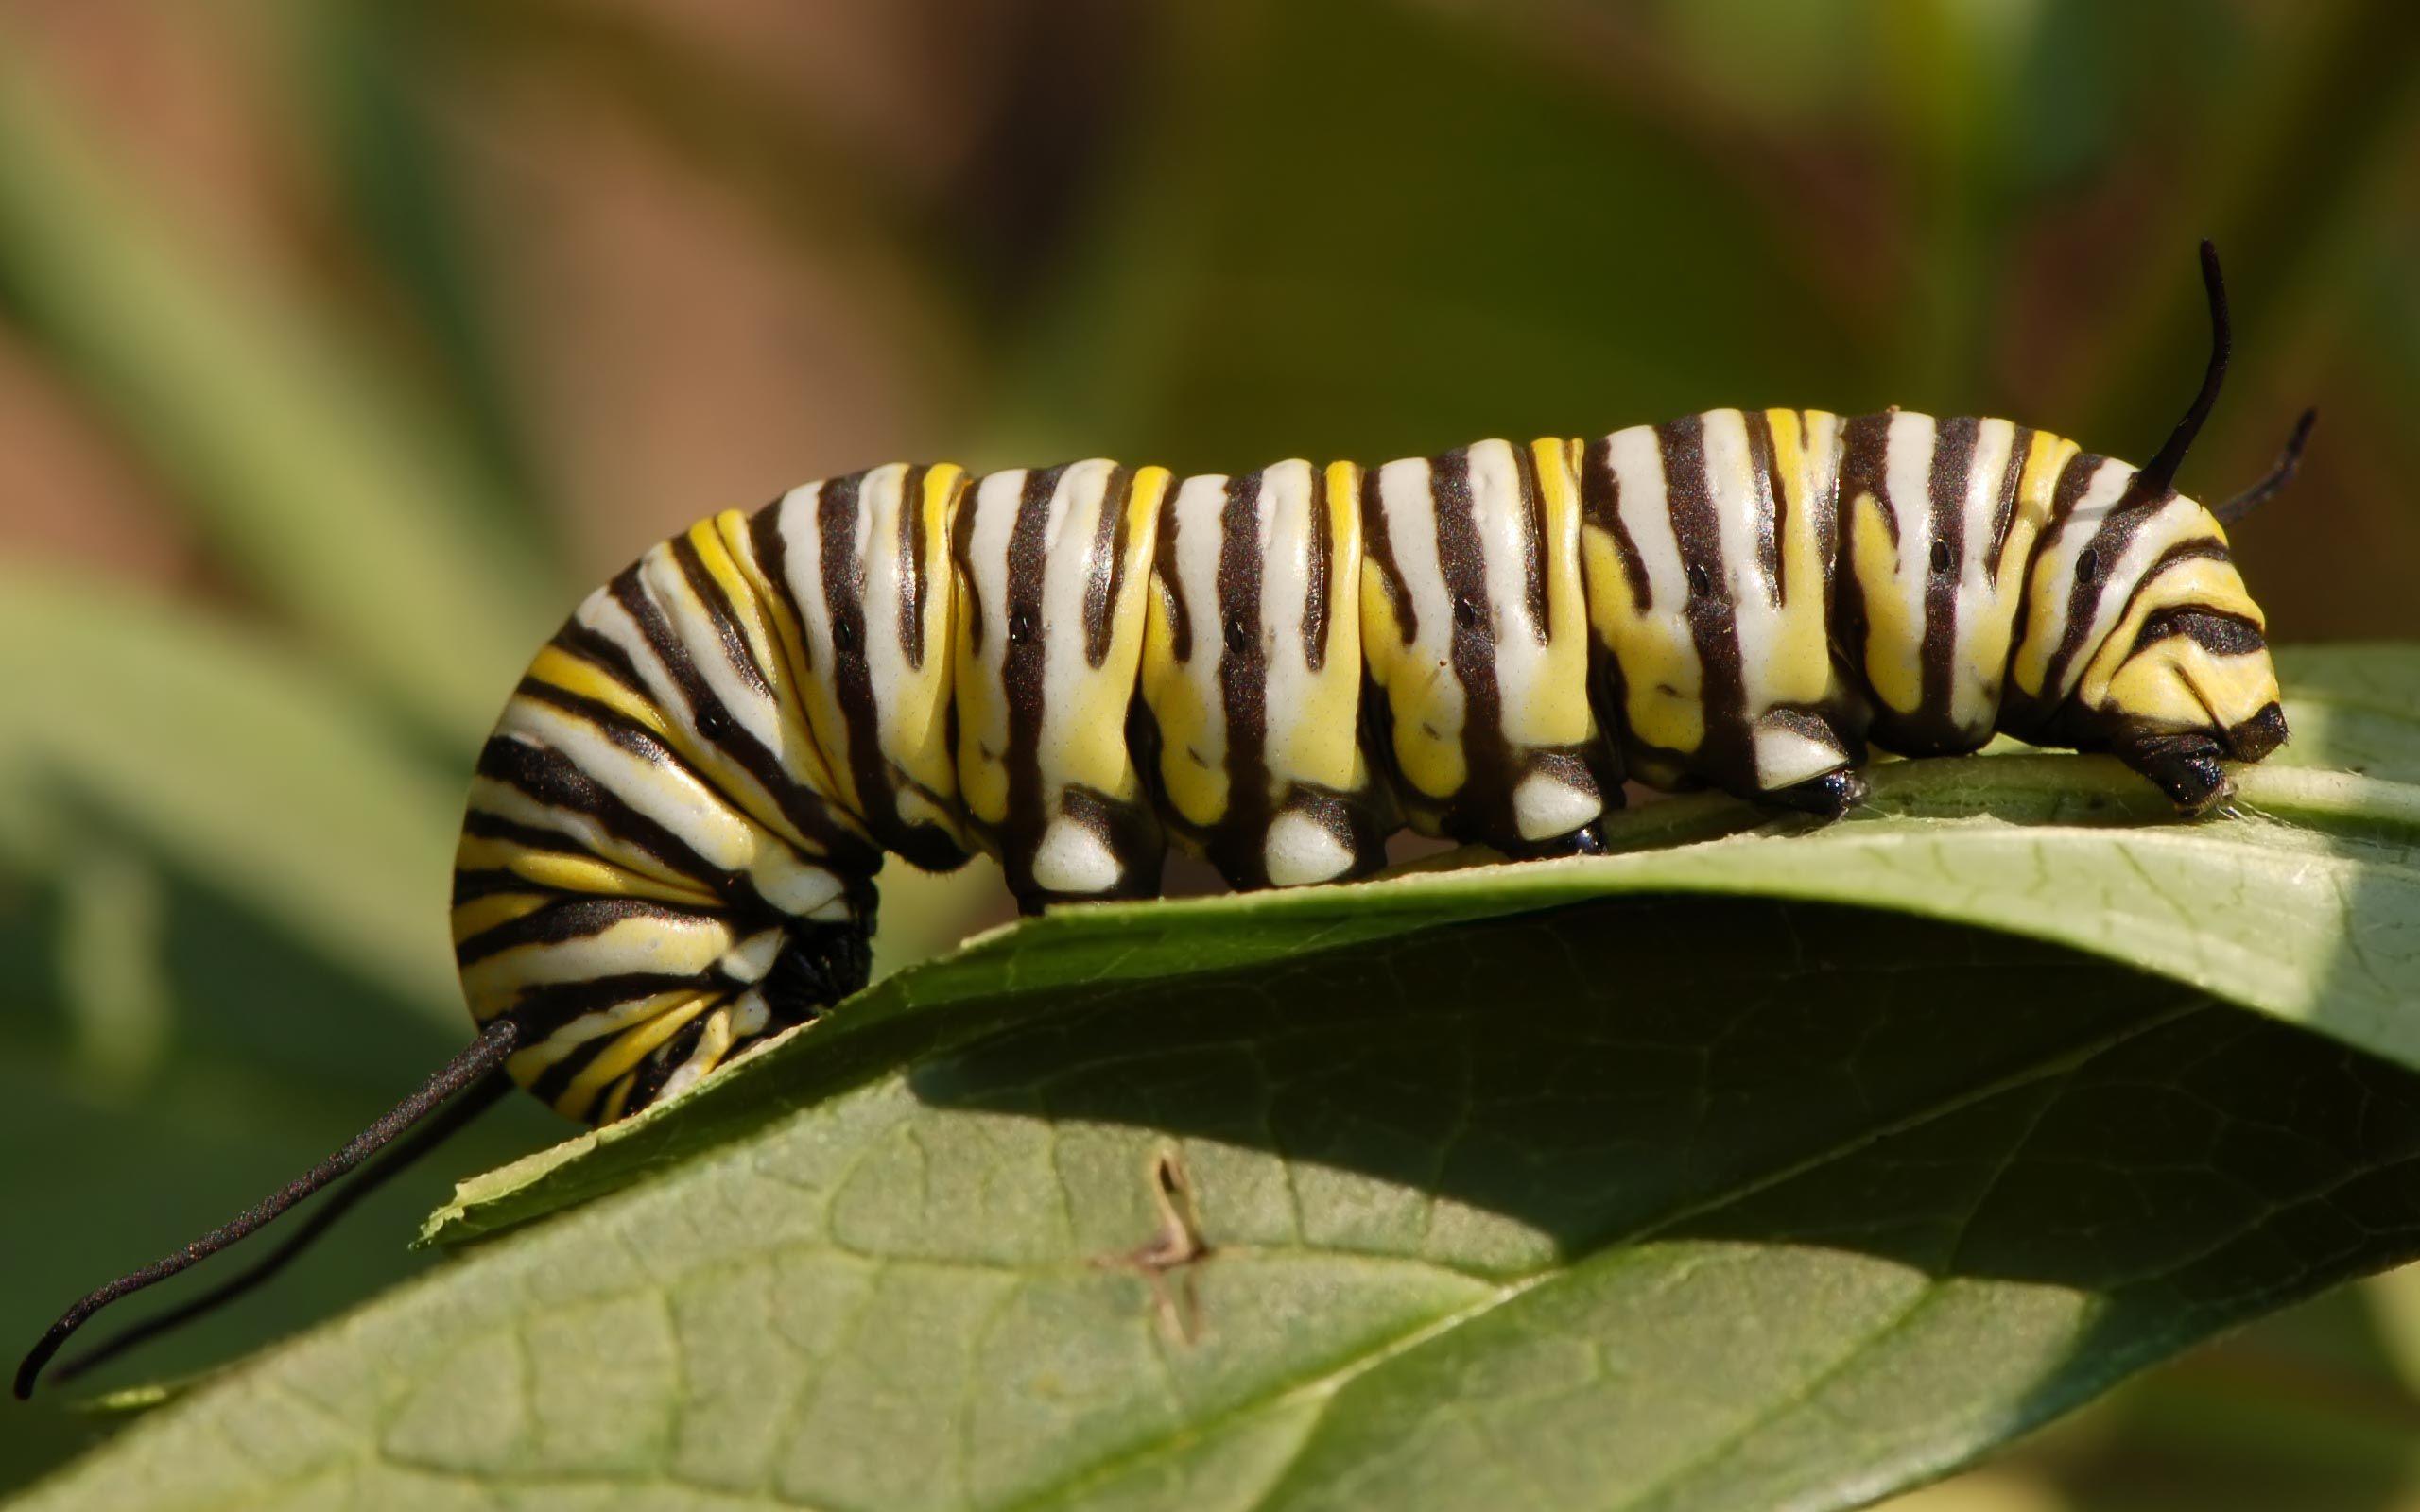 striped insect | Geometrie | Pinterest | Geometrie